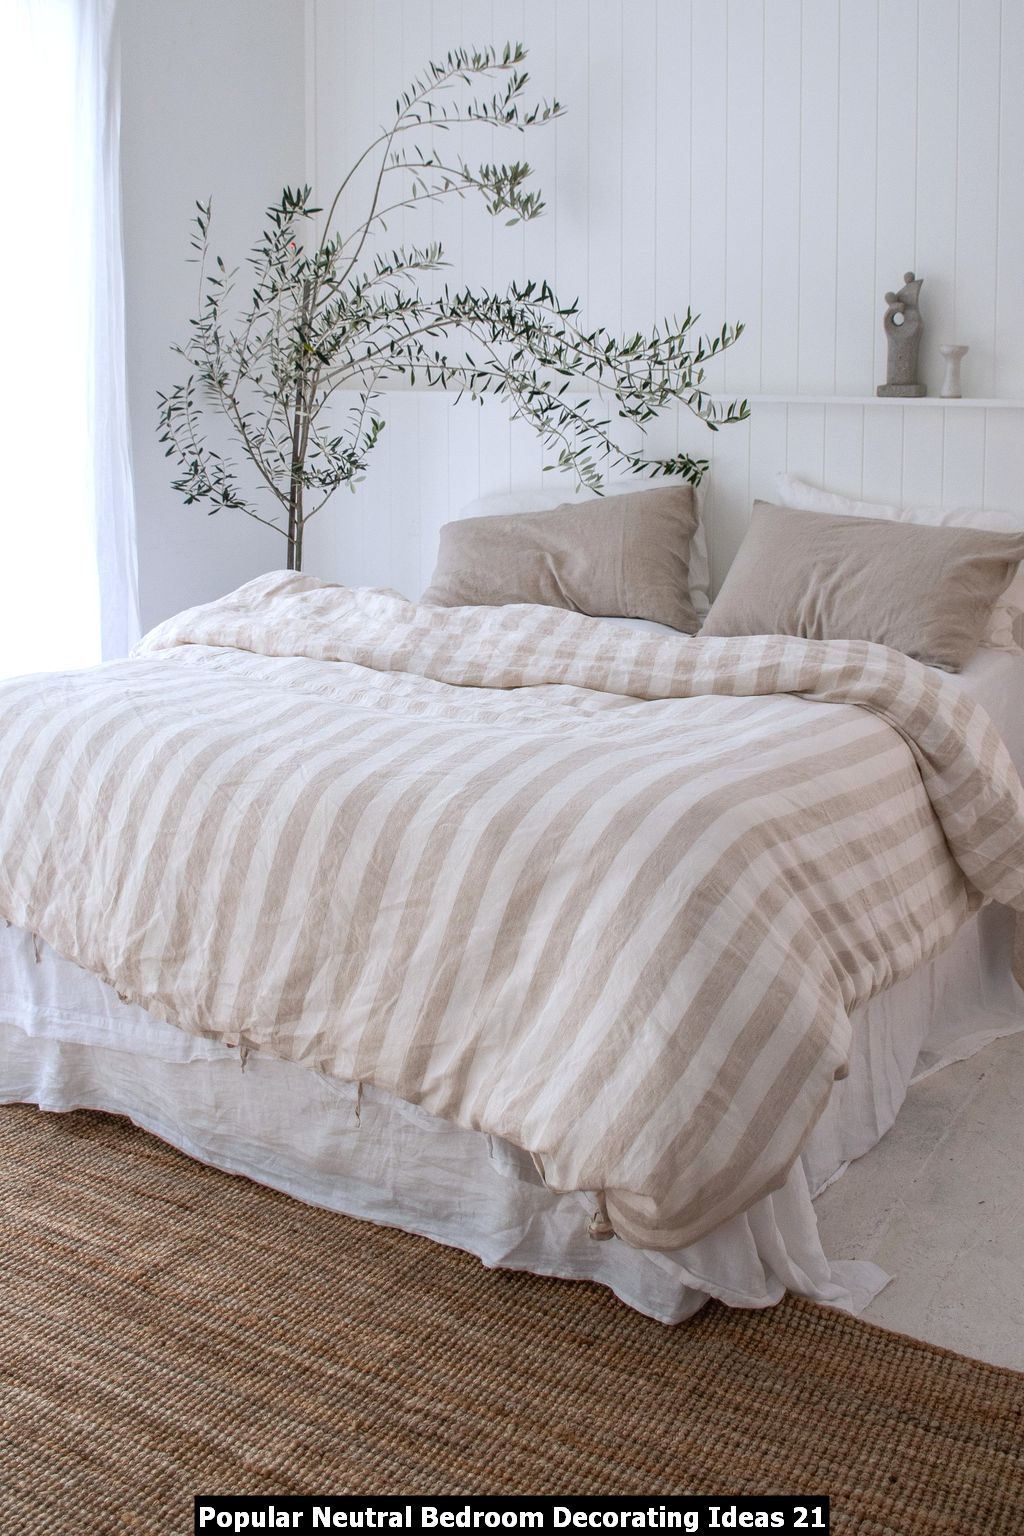 Popular Neutral Bedroom Decorating Ideas 21